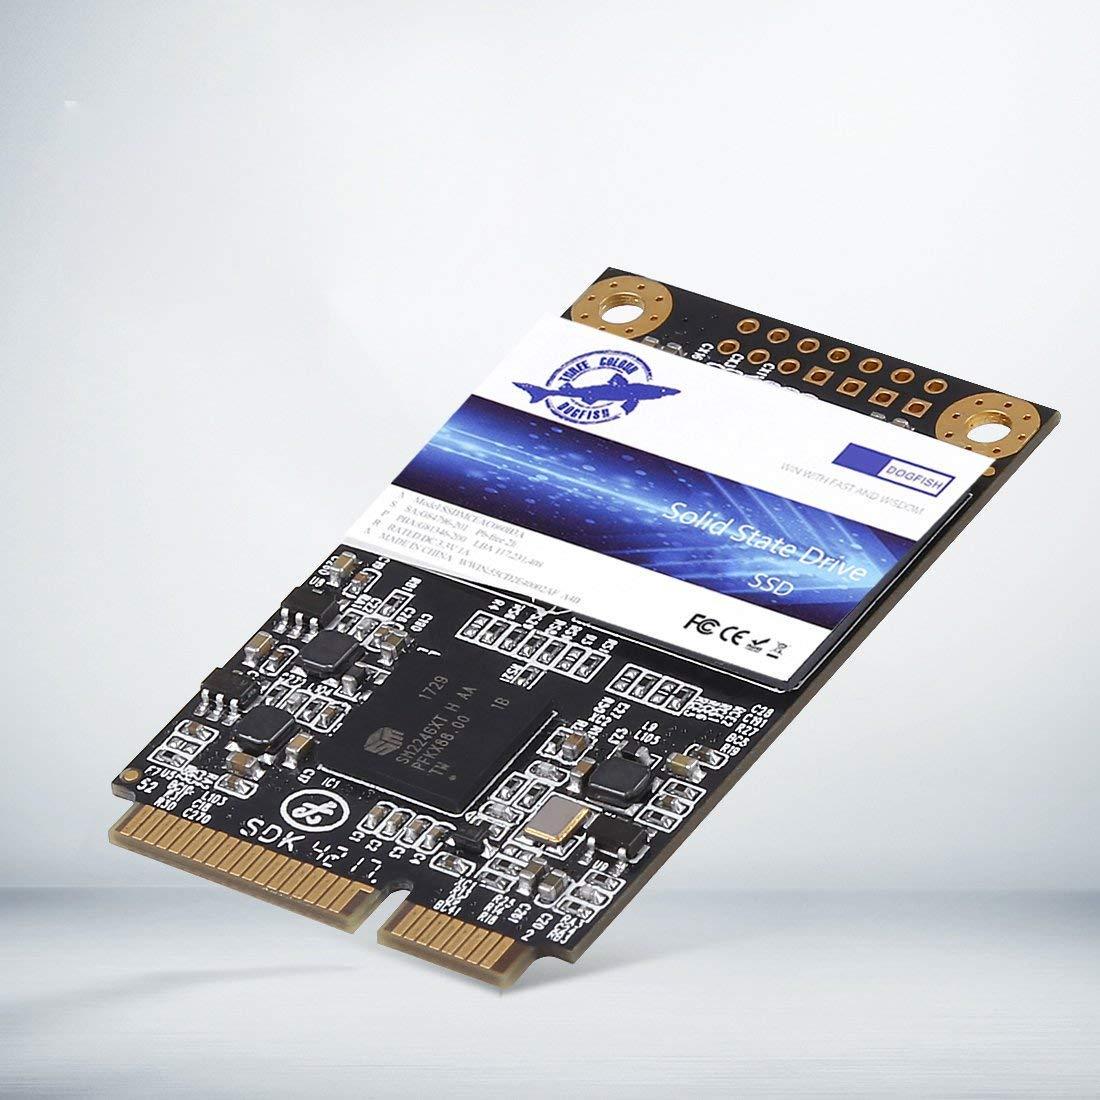 Dogfish Msata 32GB 60GB 64GB 120GB 128GB 240GB 250GB 480GB 500GB ...